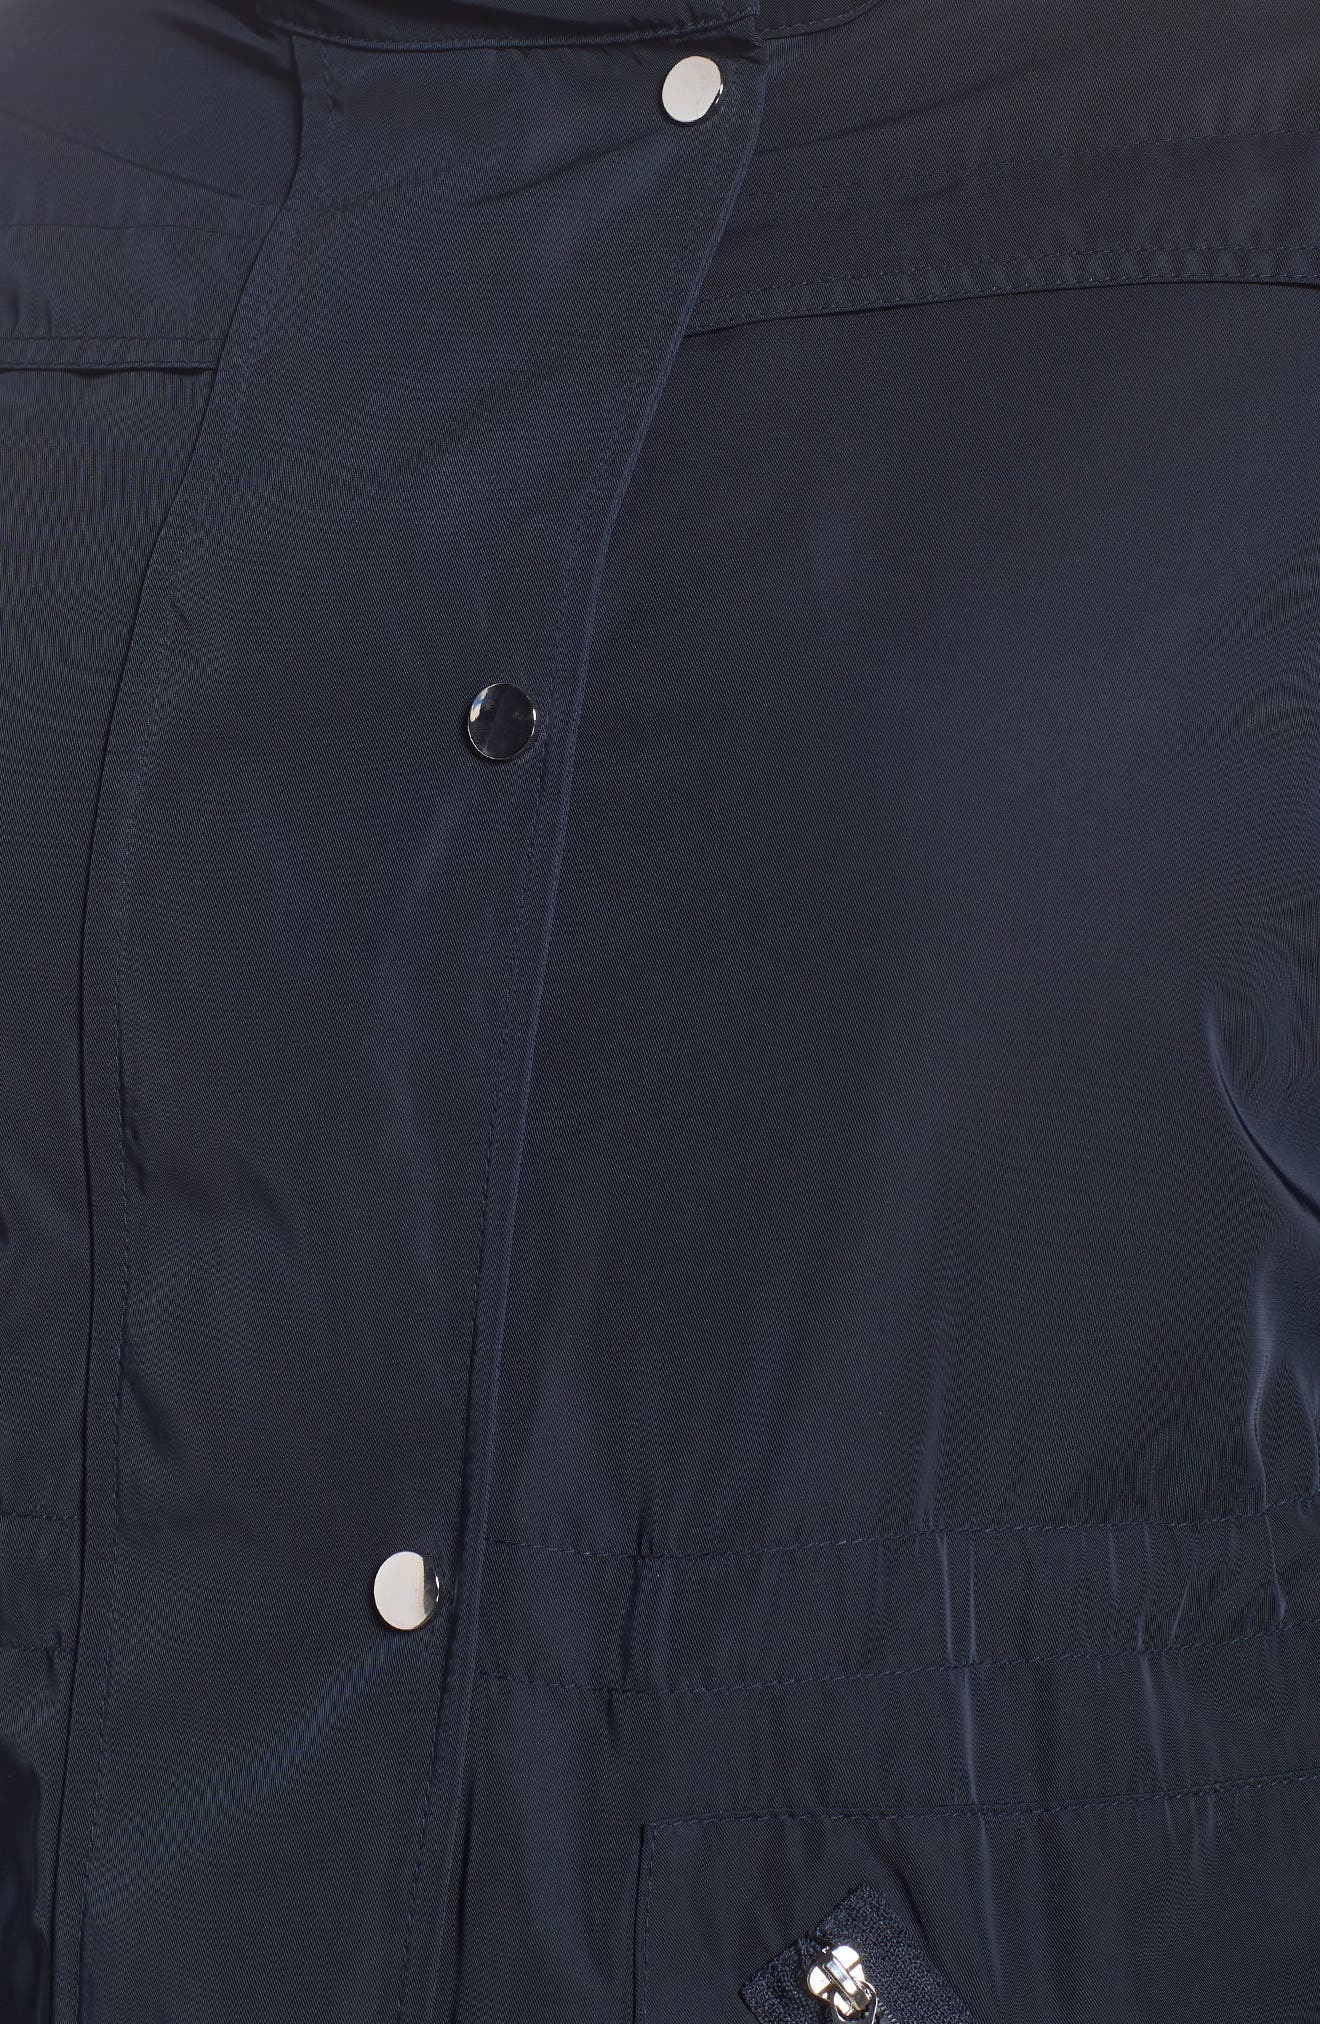 Zip Trim Jacket,                             Alternate thumbnail 4, color,                             Navy Blue